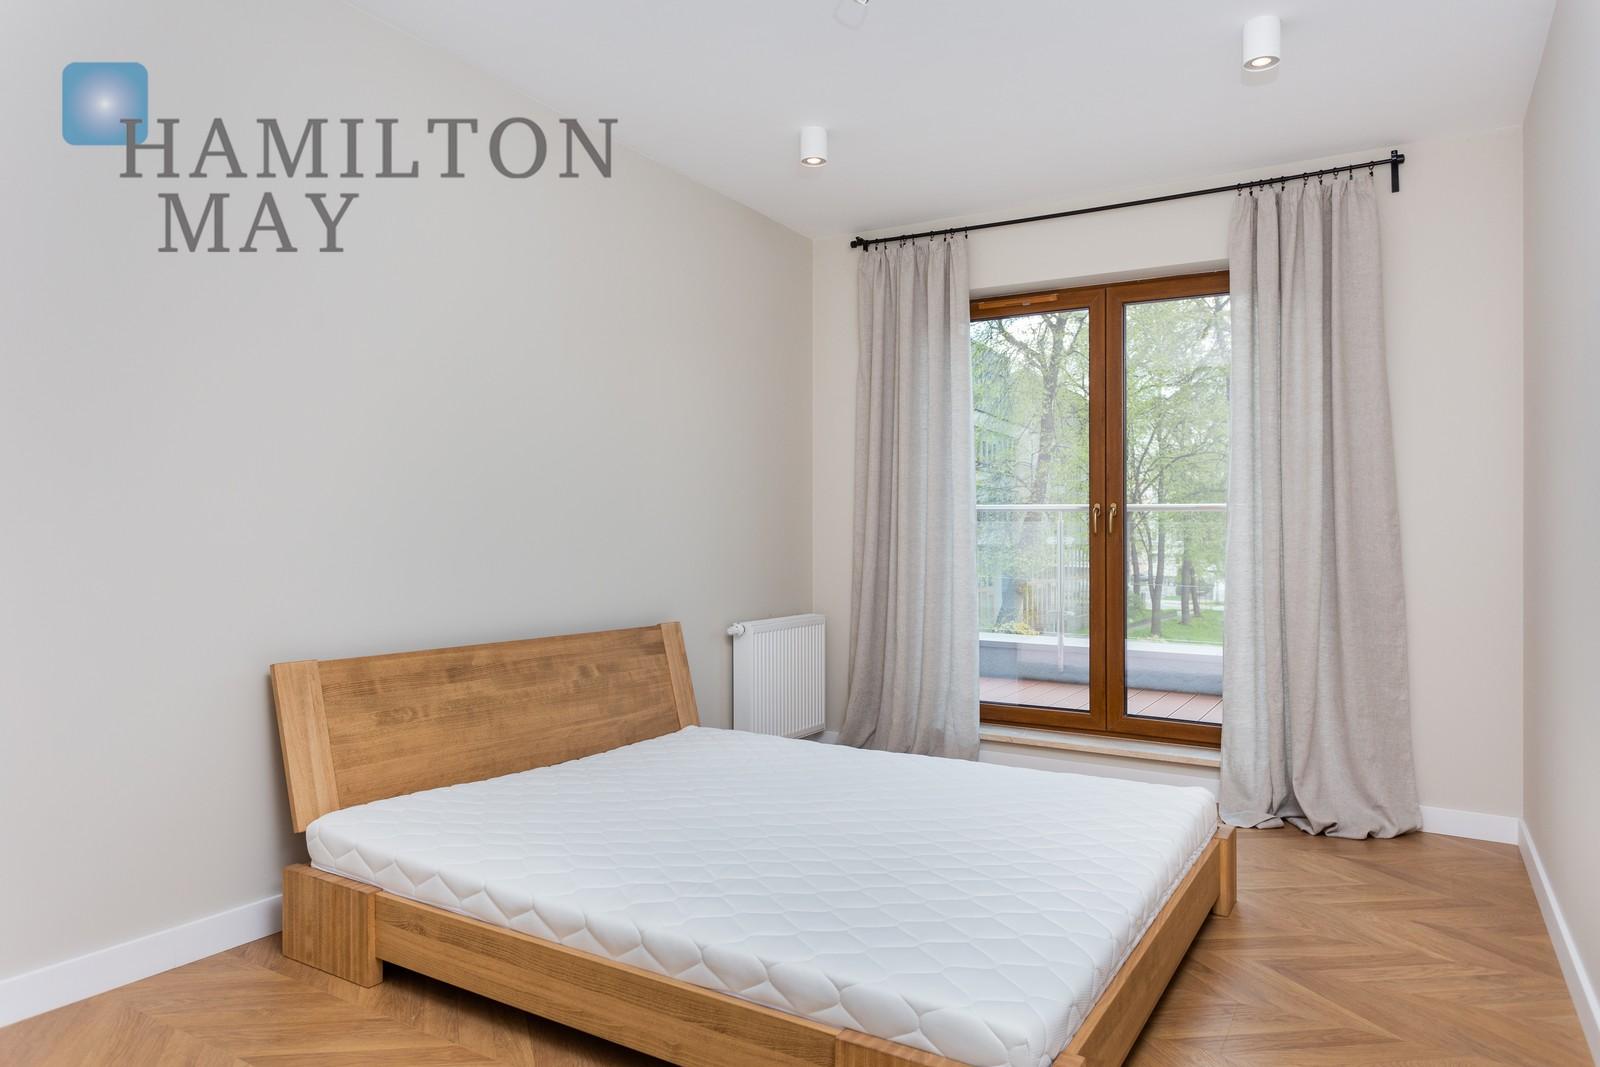 Stylish apartment with a balconyin Grzegorzki Investment Krakow for rent